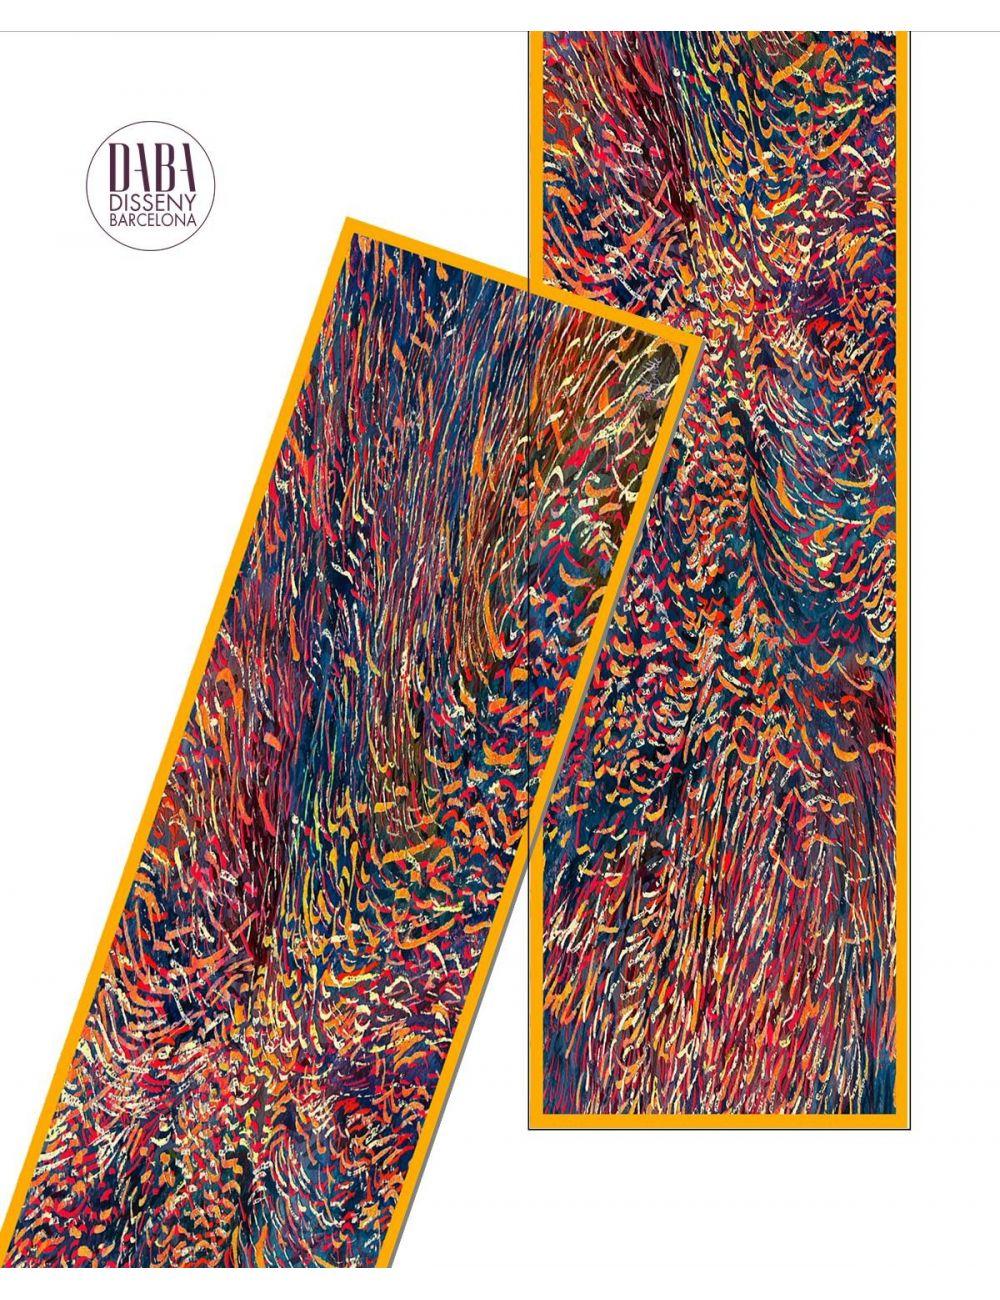 97ae92f7673 Men's extra long silk scarf with a fire like print | Dabadisseny.com